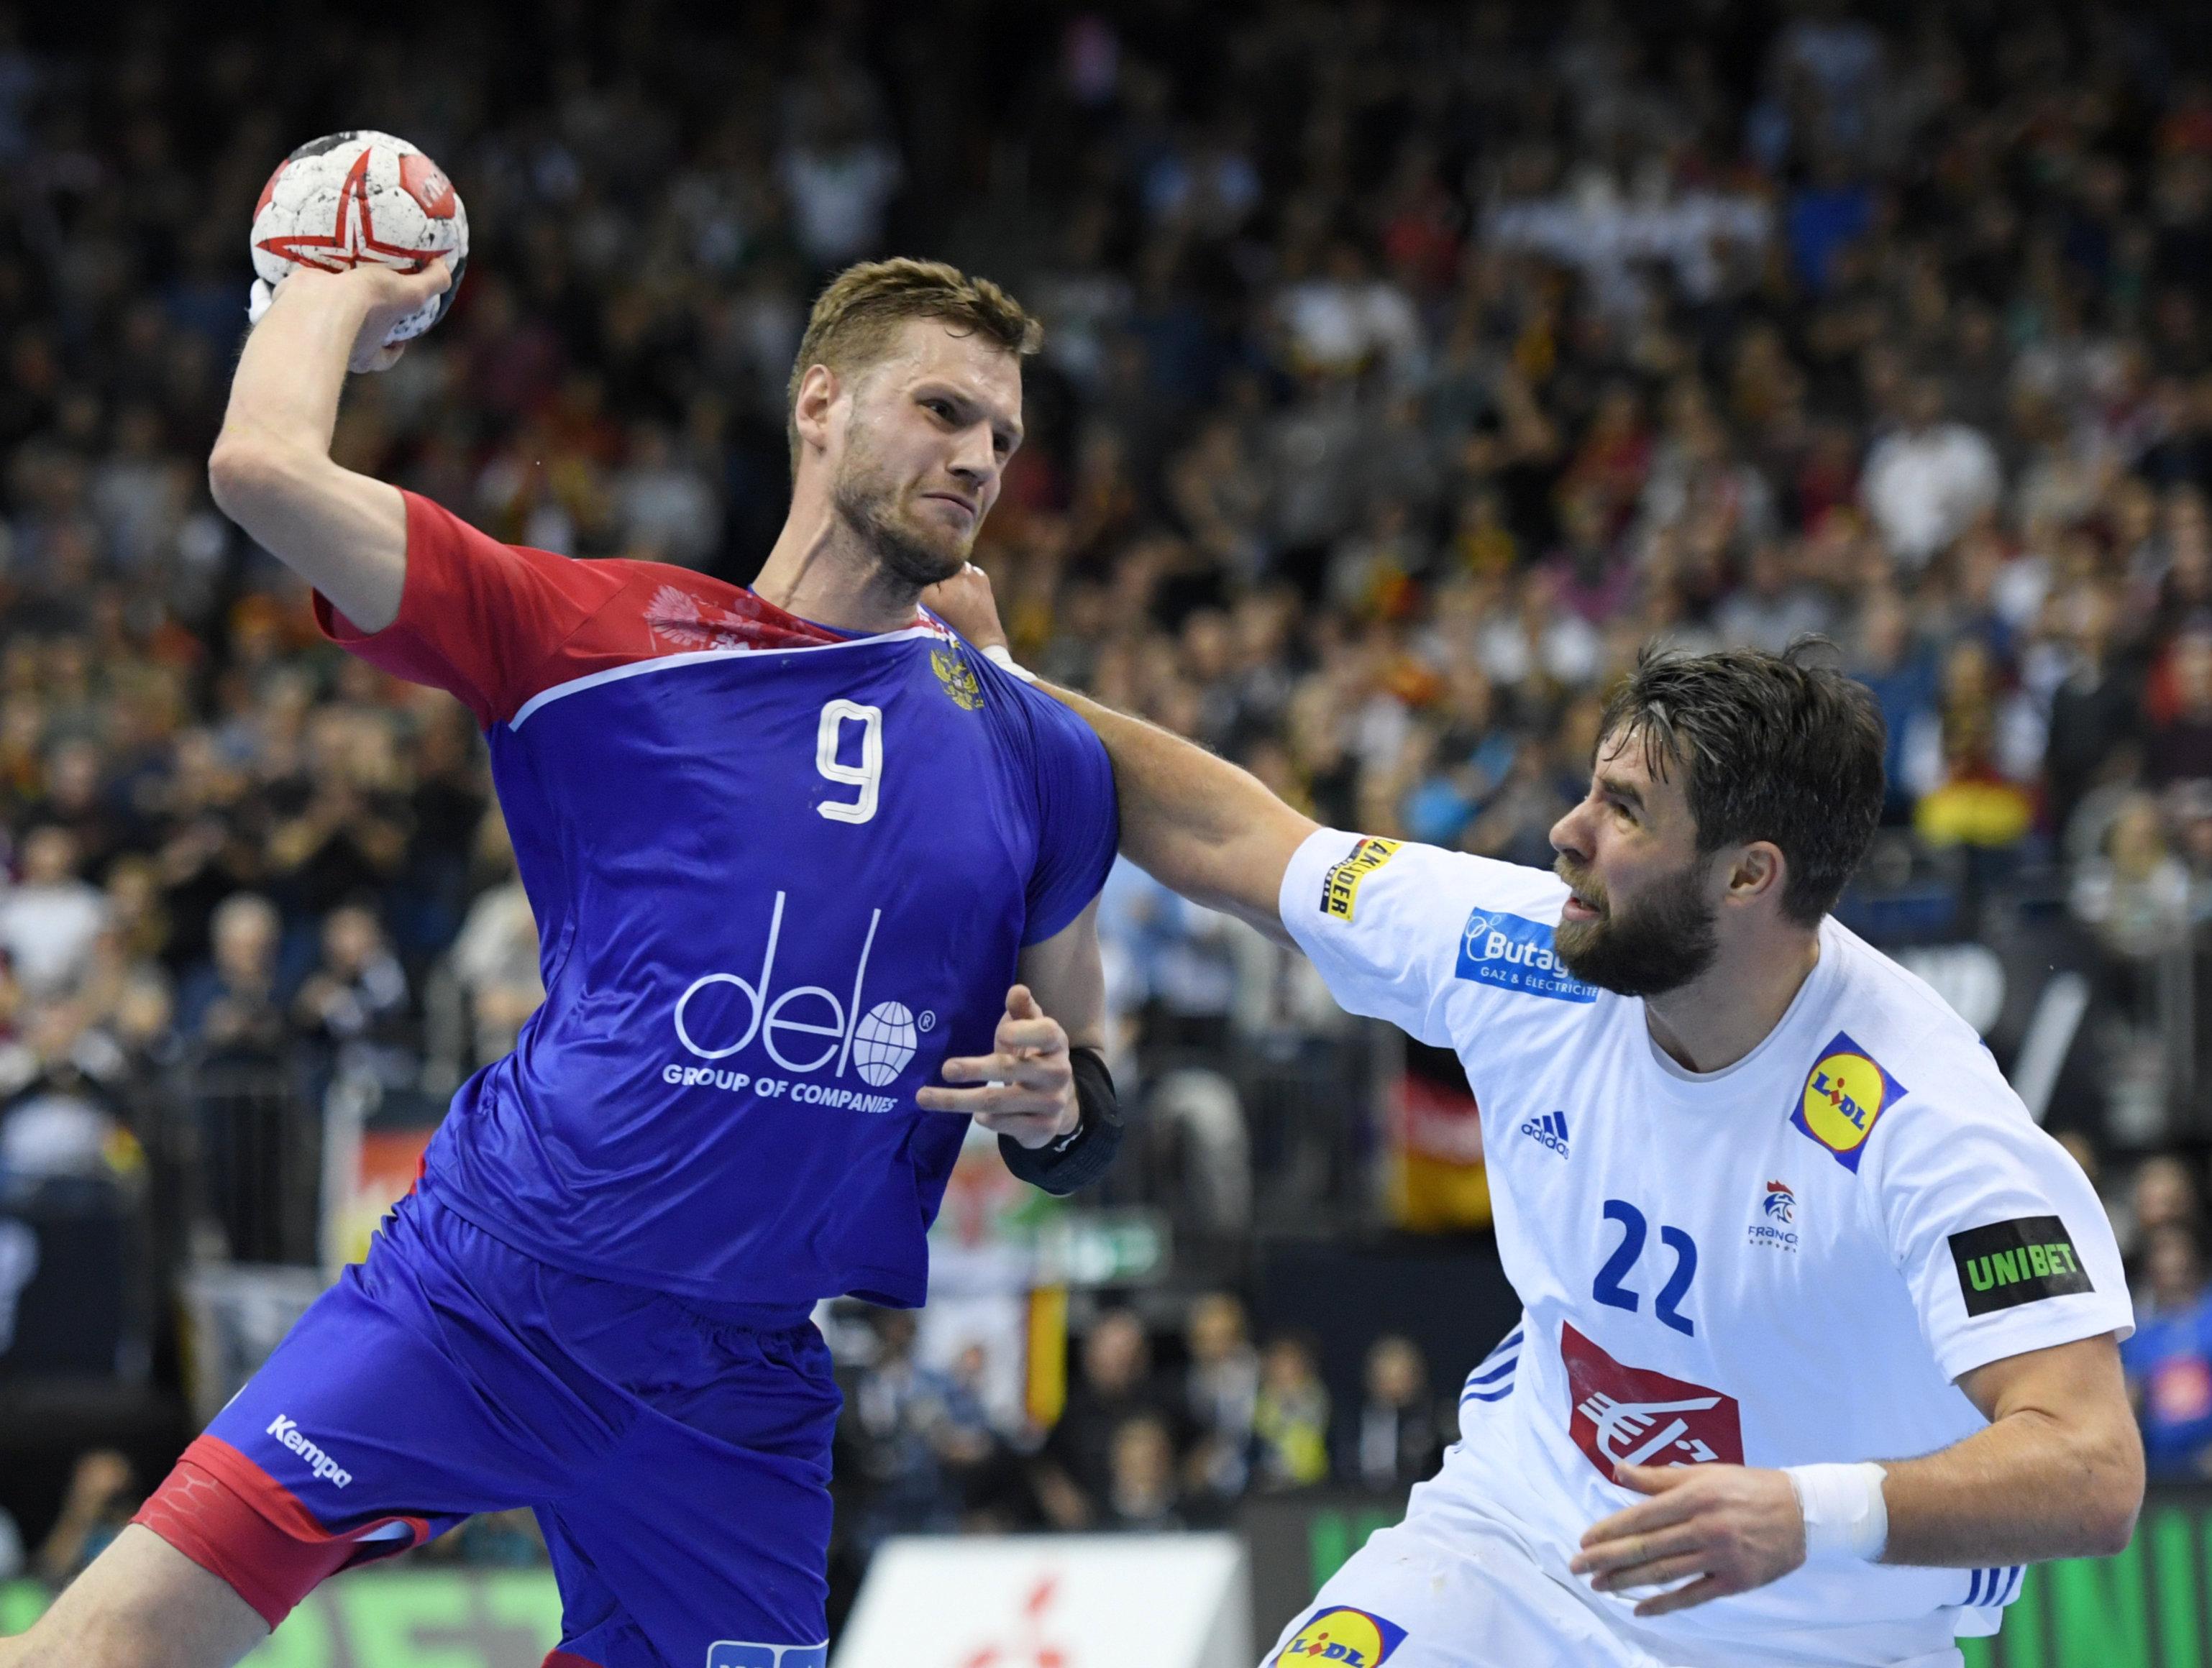 Handball - Equipe de France - Mondial 2019 : «Un jour vraiment sans» selon Luka Karabatic